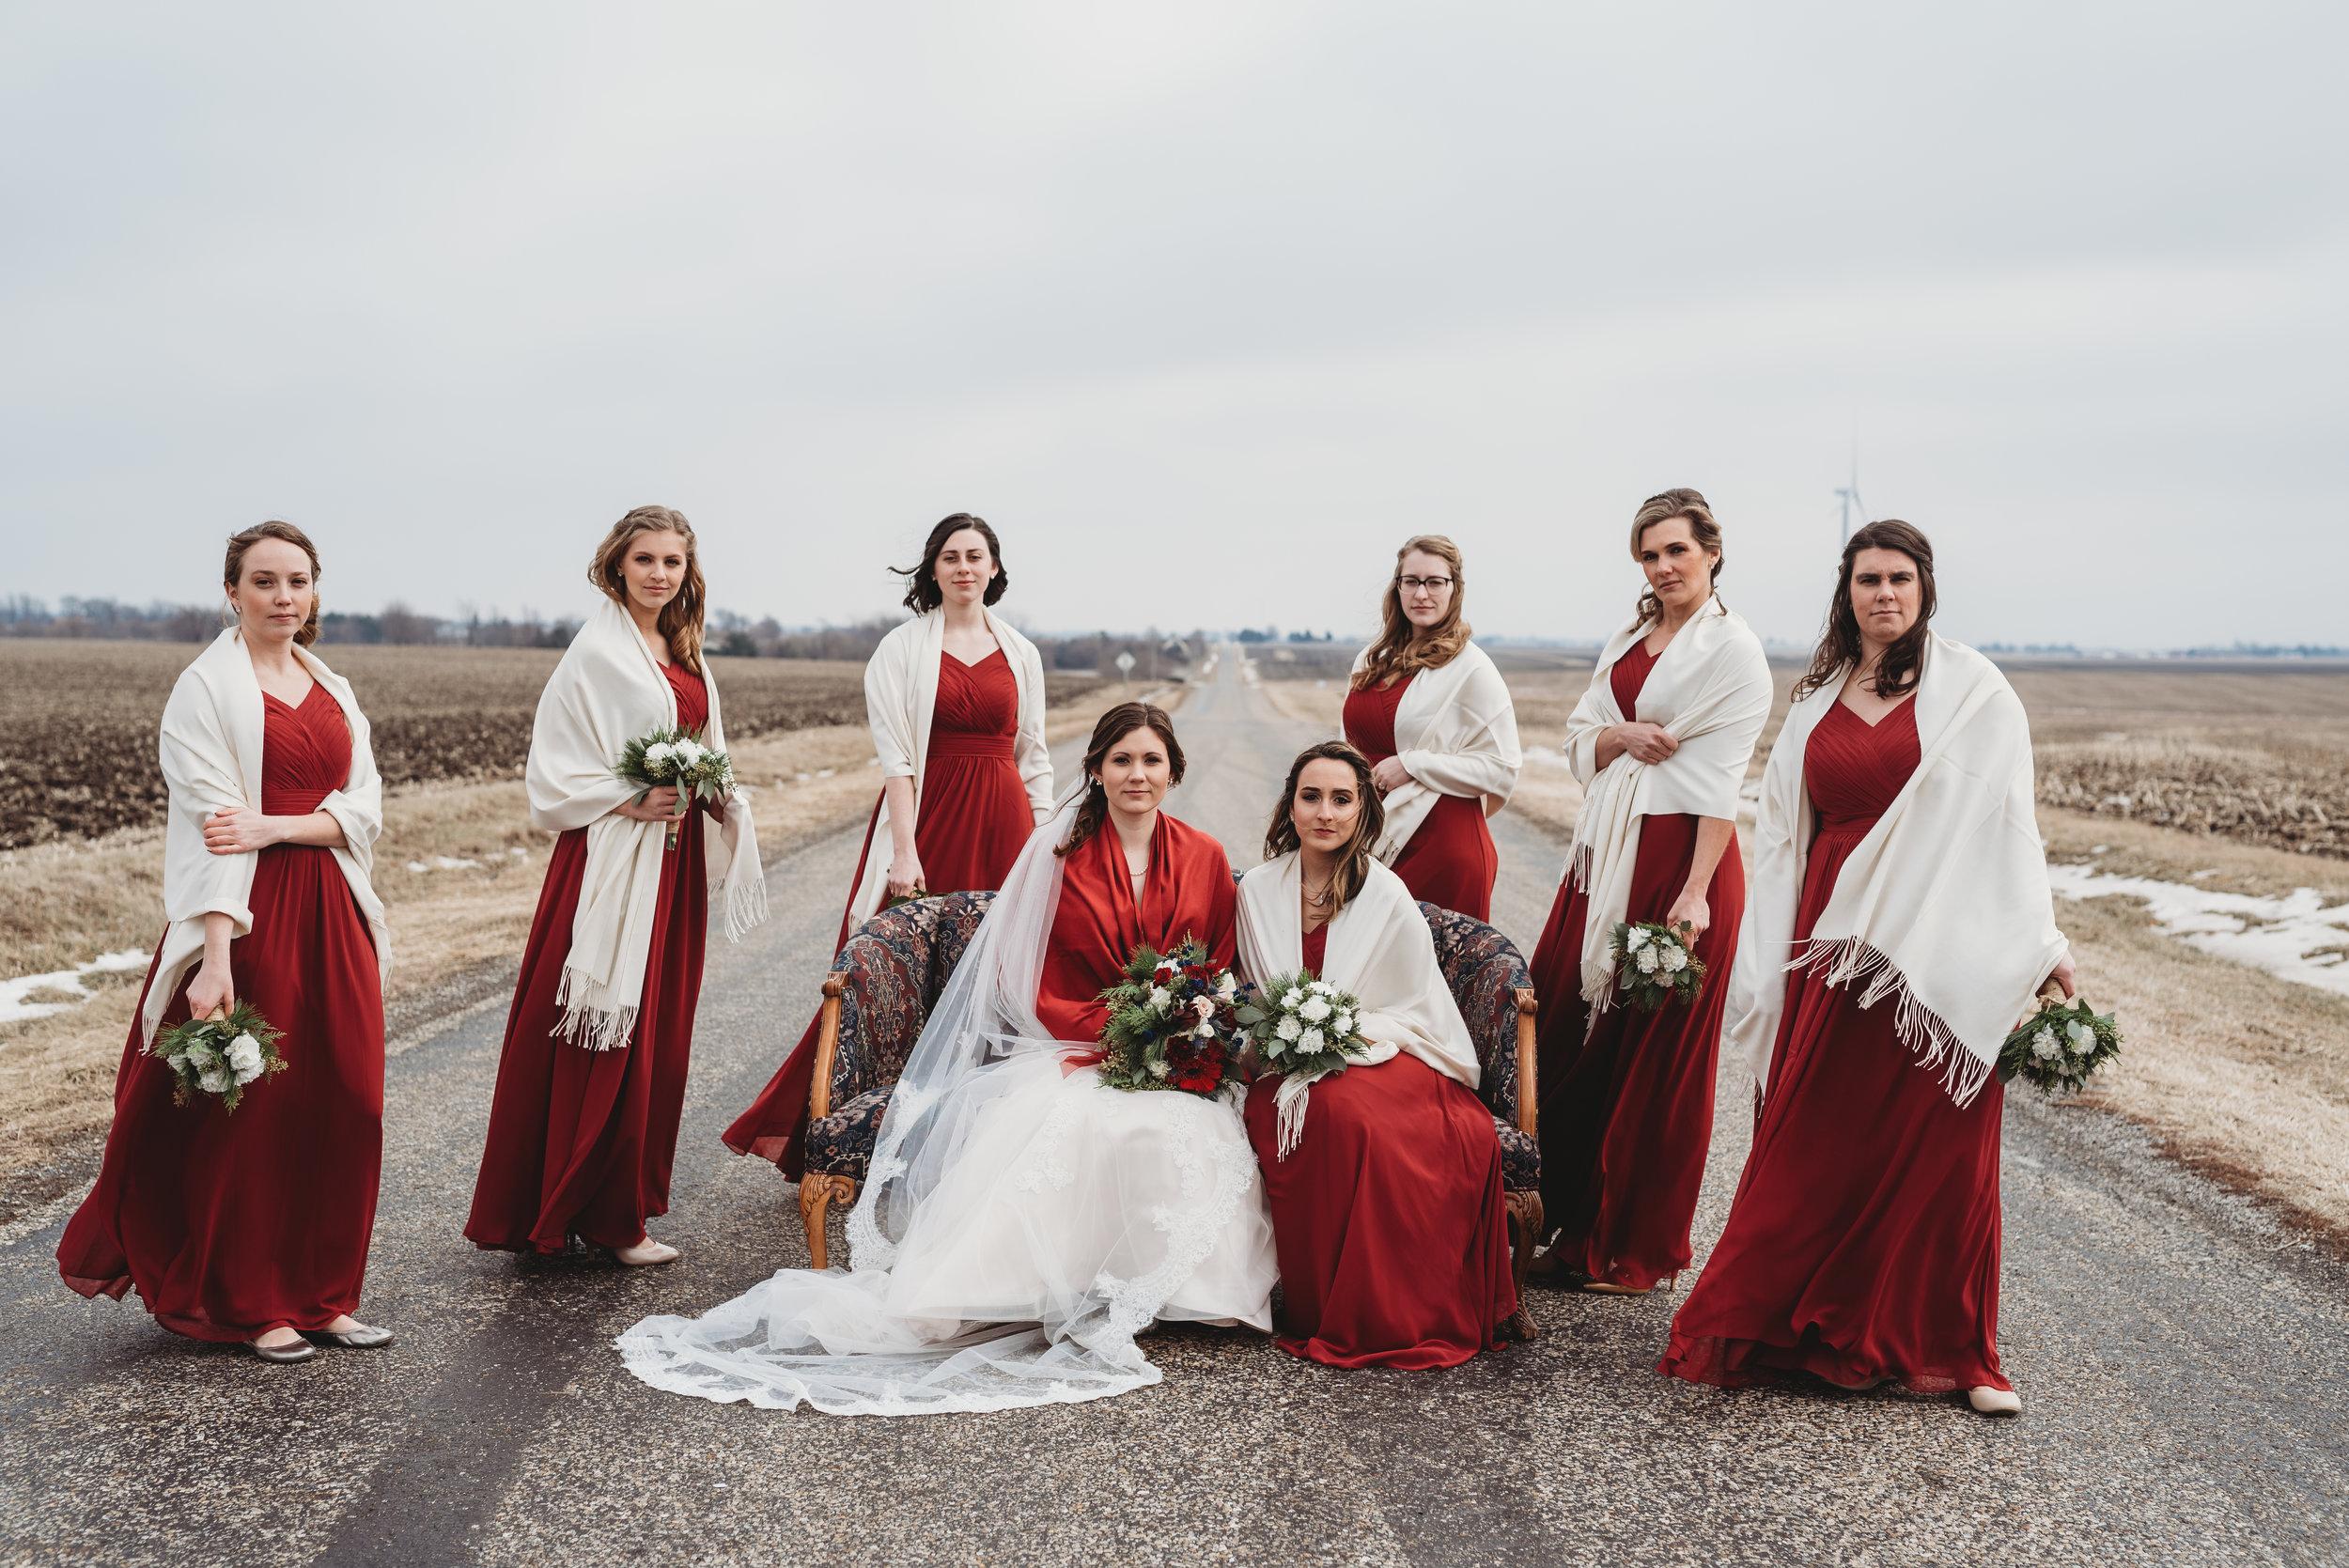 Bridesmaides-32.jpg